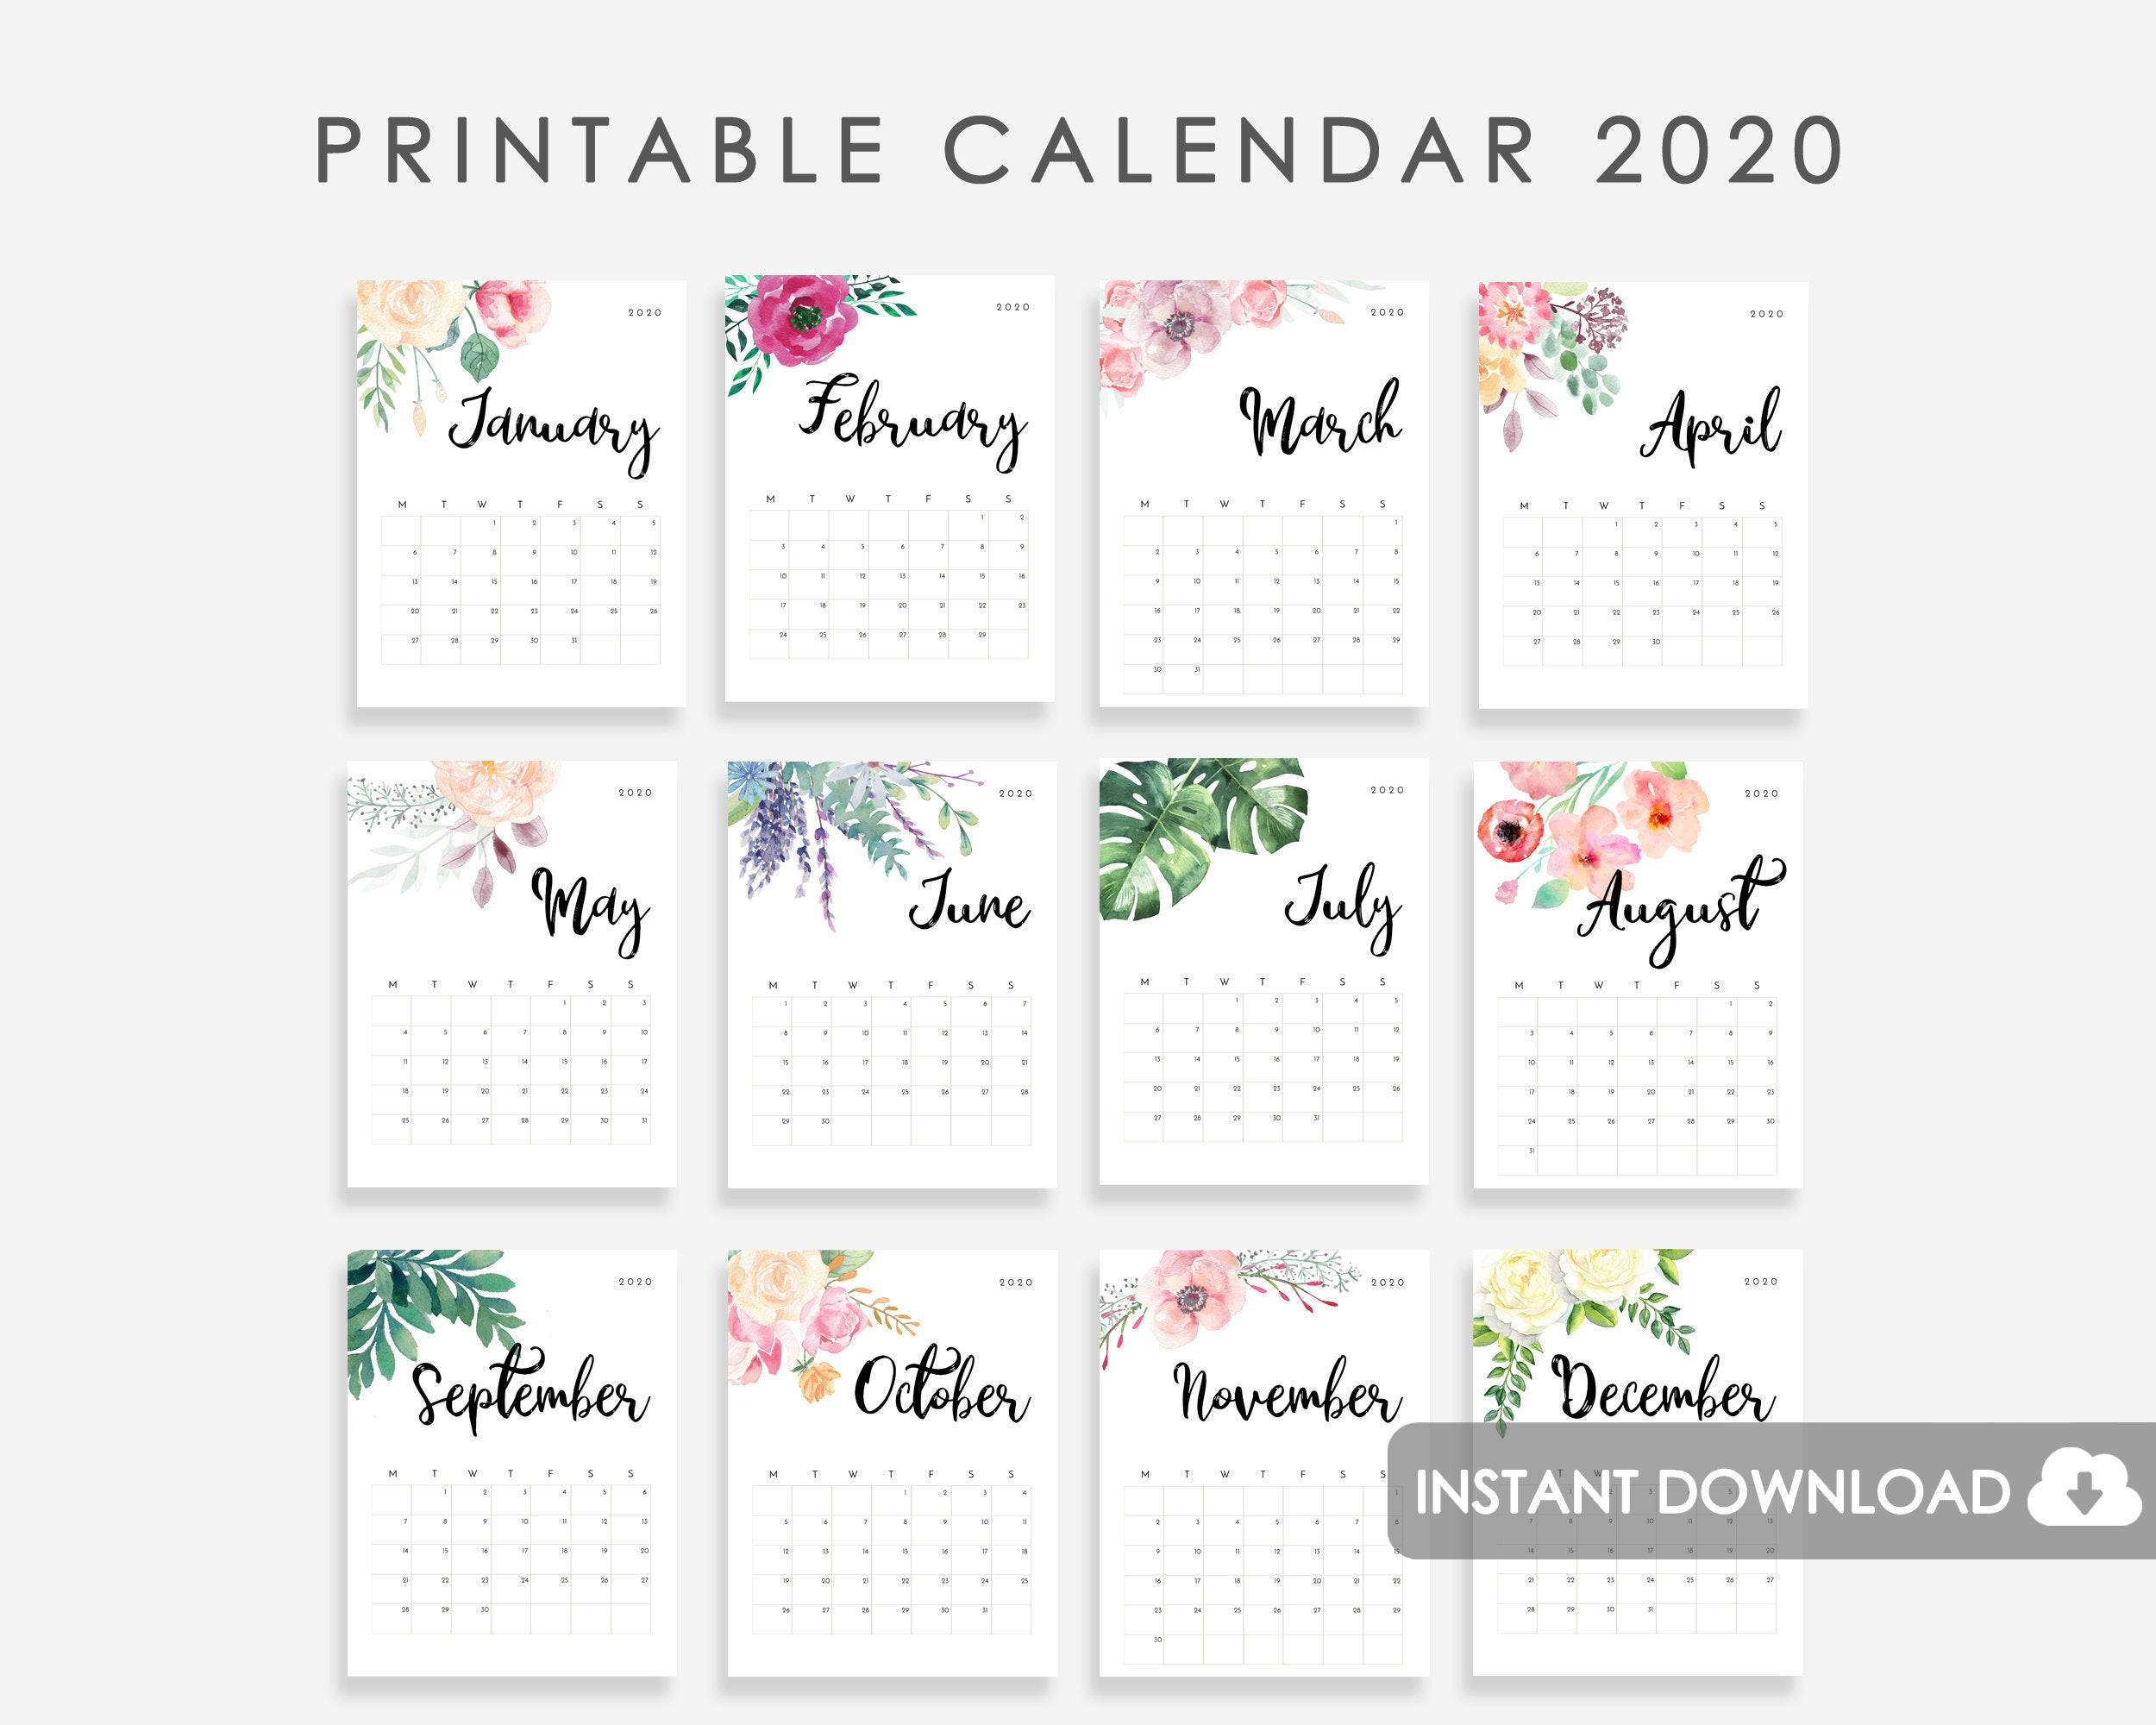 Календарь 2020 Г – Bagno.site:rut Prediction 2020 Illinois